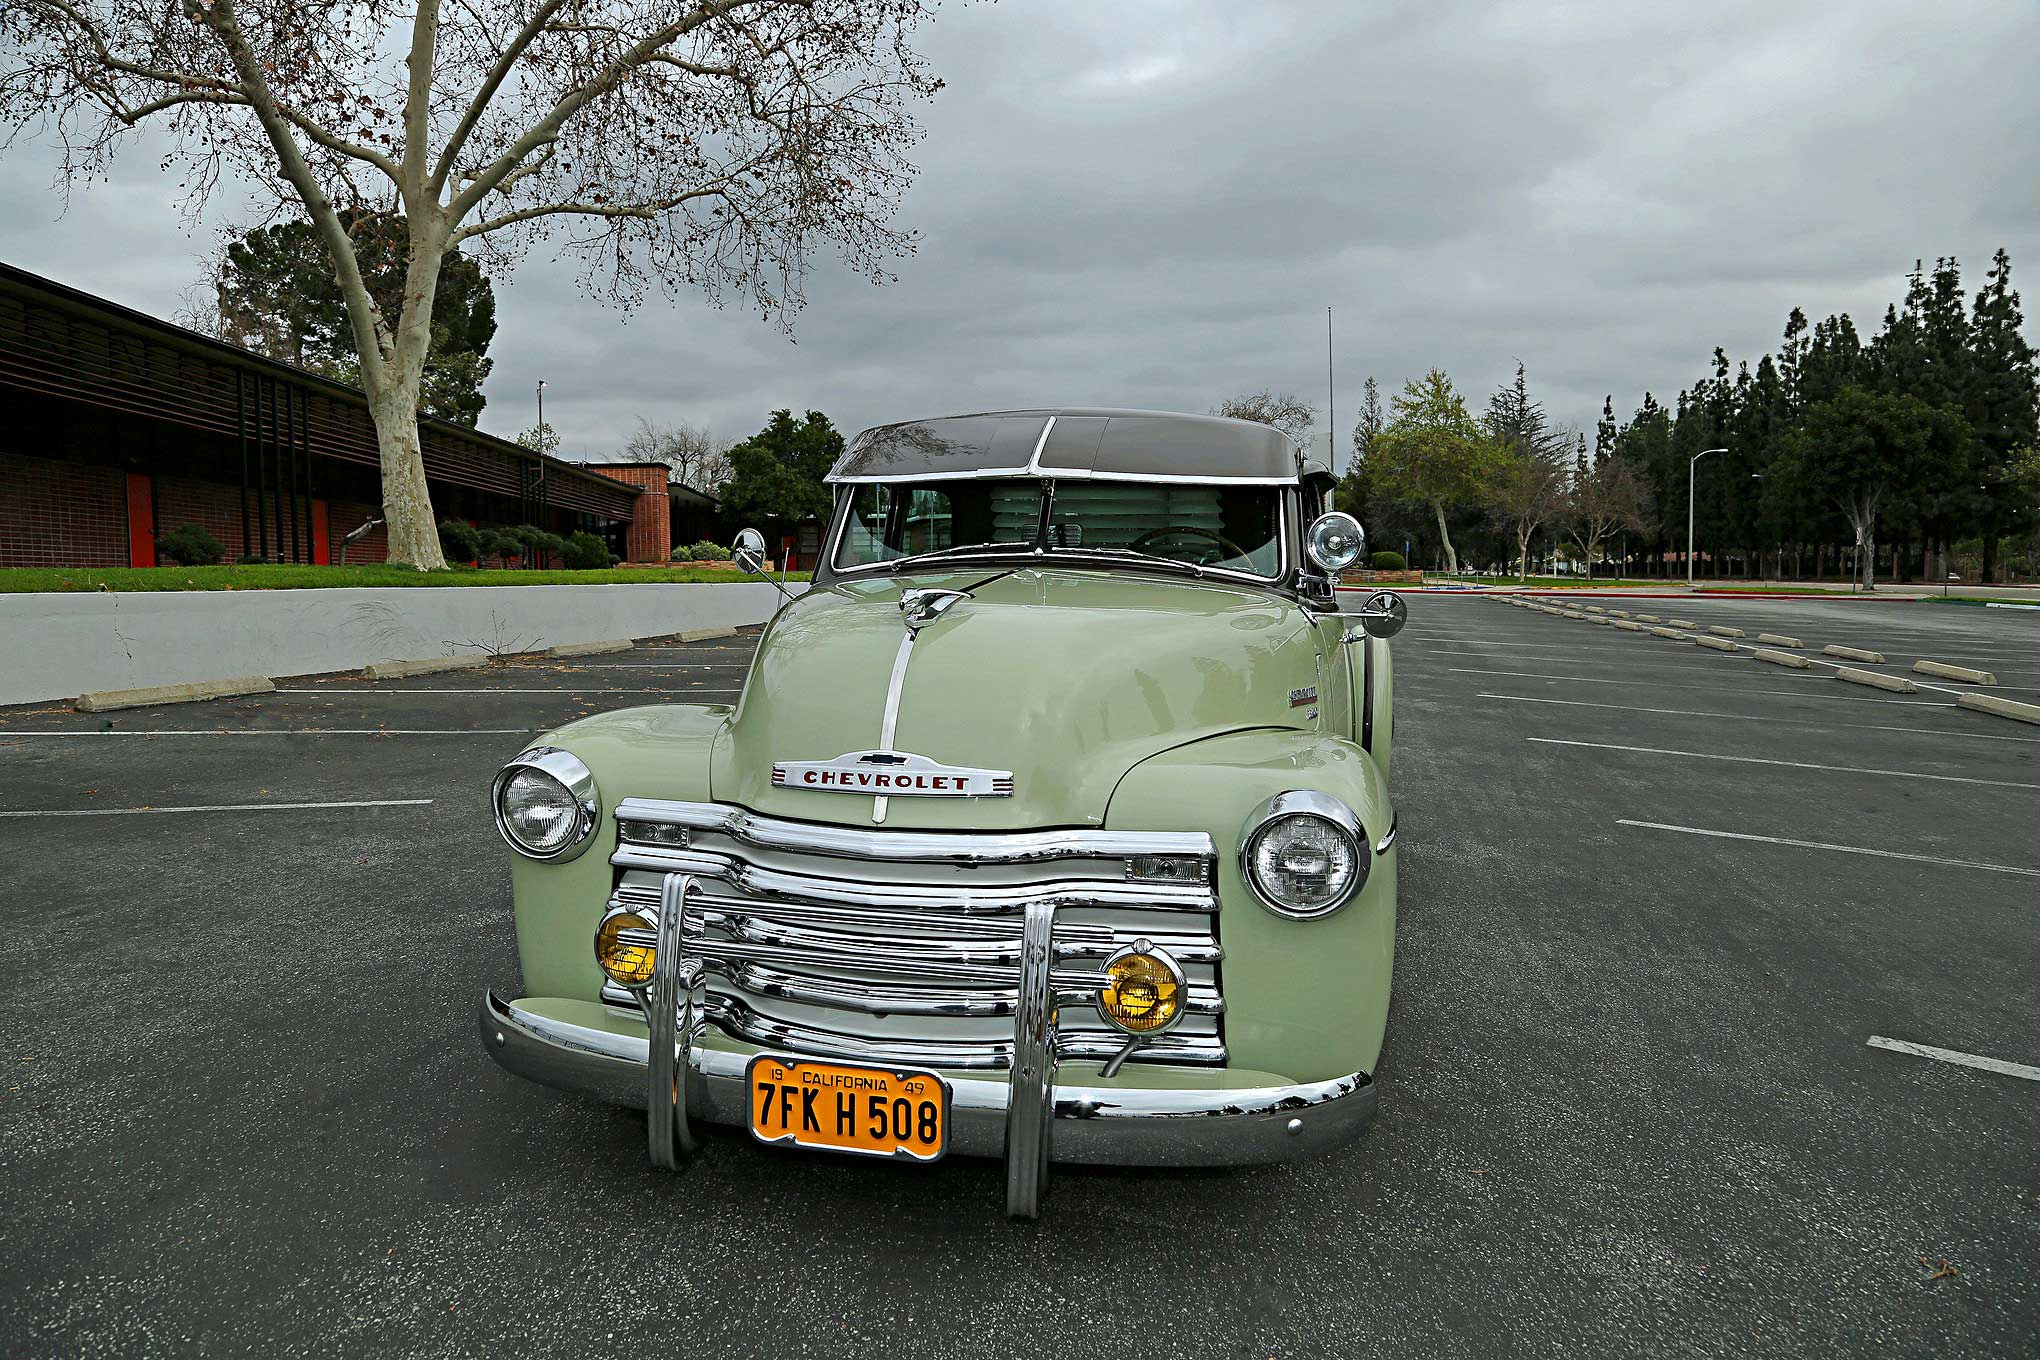 1949 Chevrolet 3100 The Sgv Stepside Chevy Truck 26 32